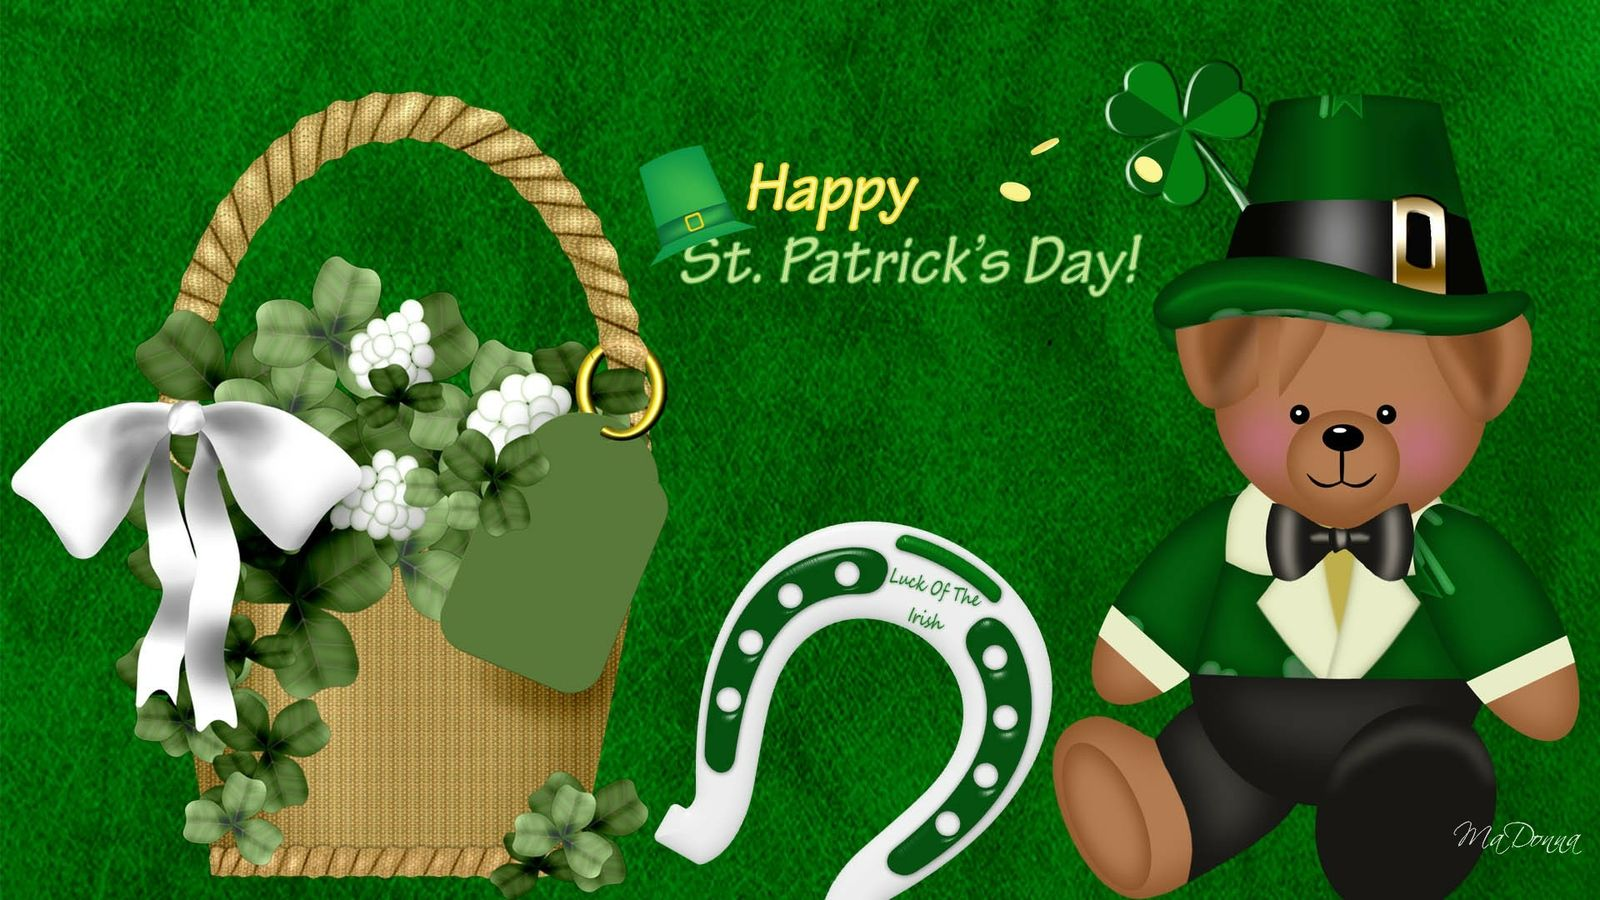 St Patricks Day Backgrounds Download Saint Patricks Day 1600x900